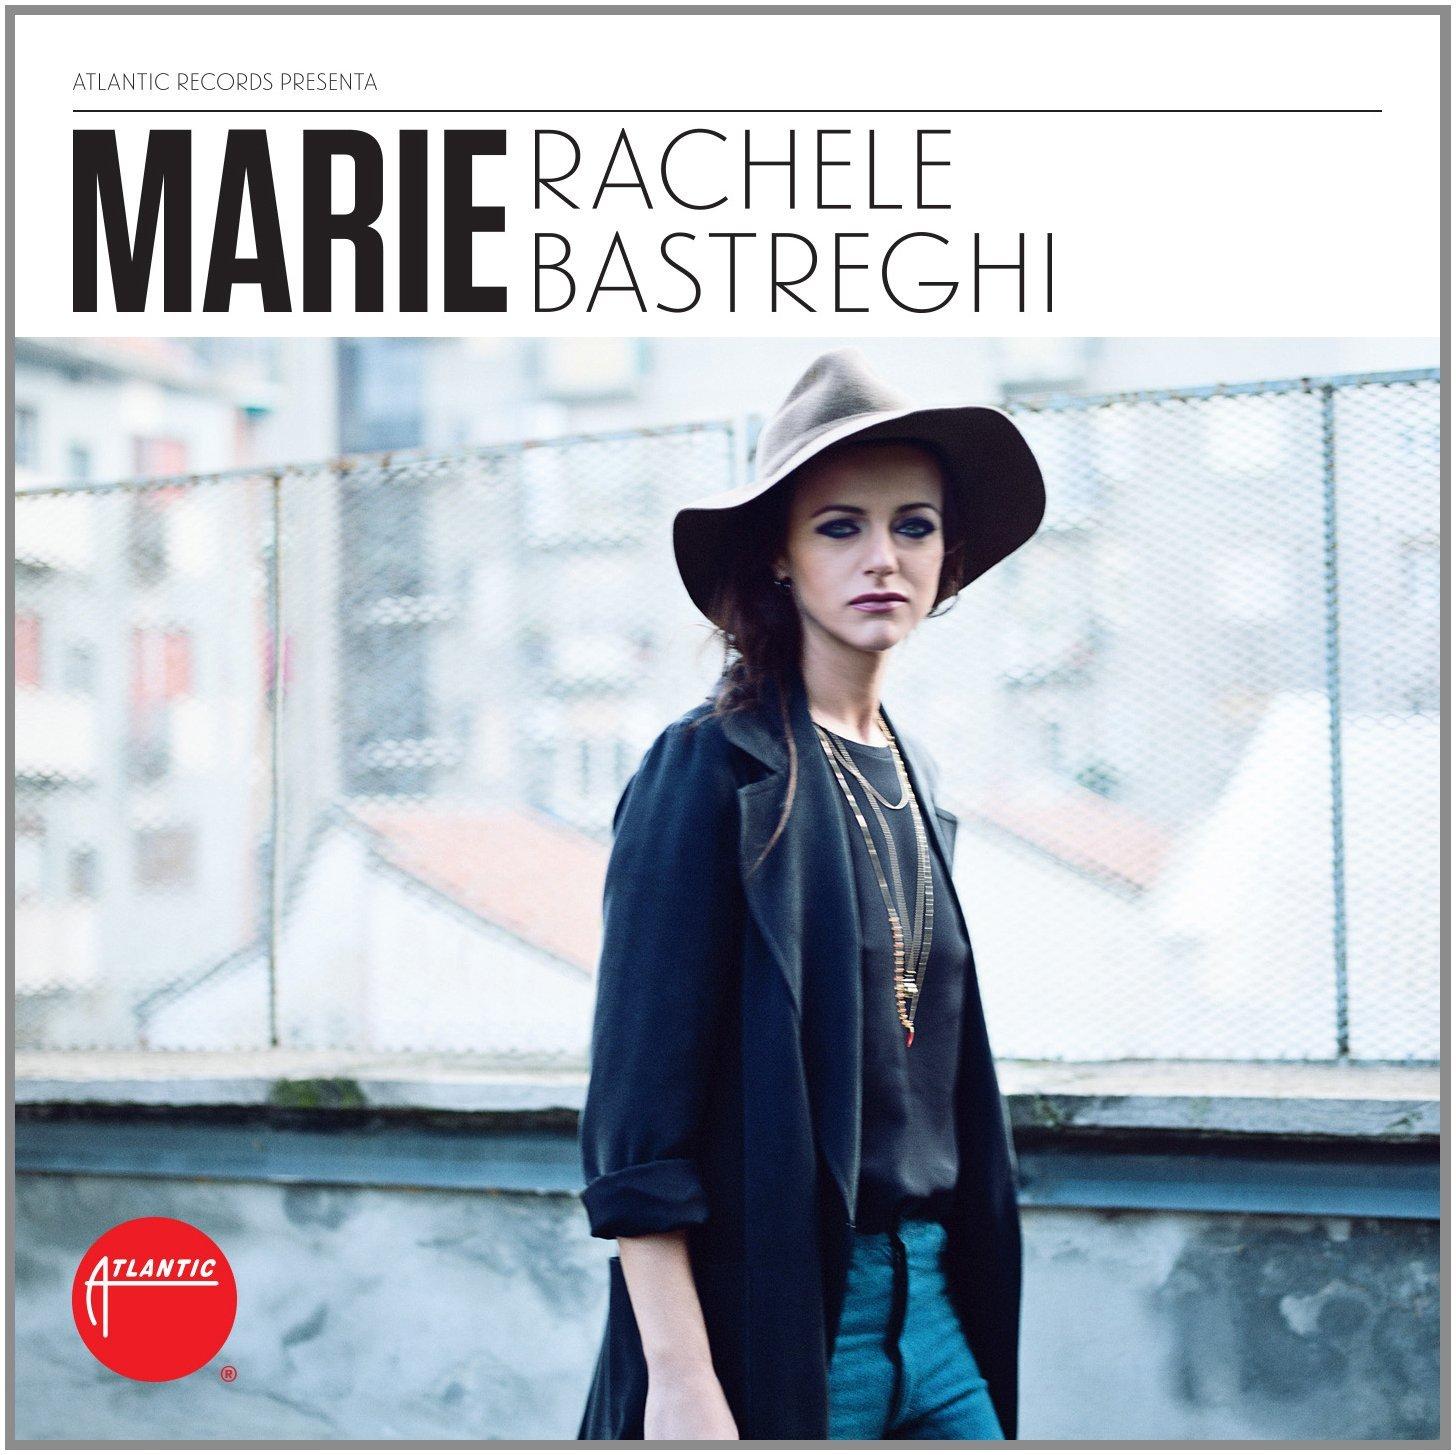 Copertina Disco Vinile 33 giri Marie di Rachele Bastreghi